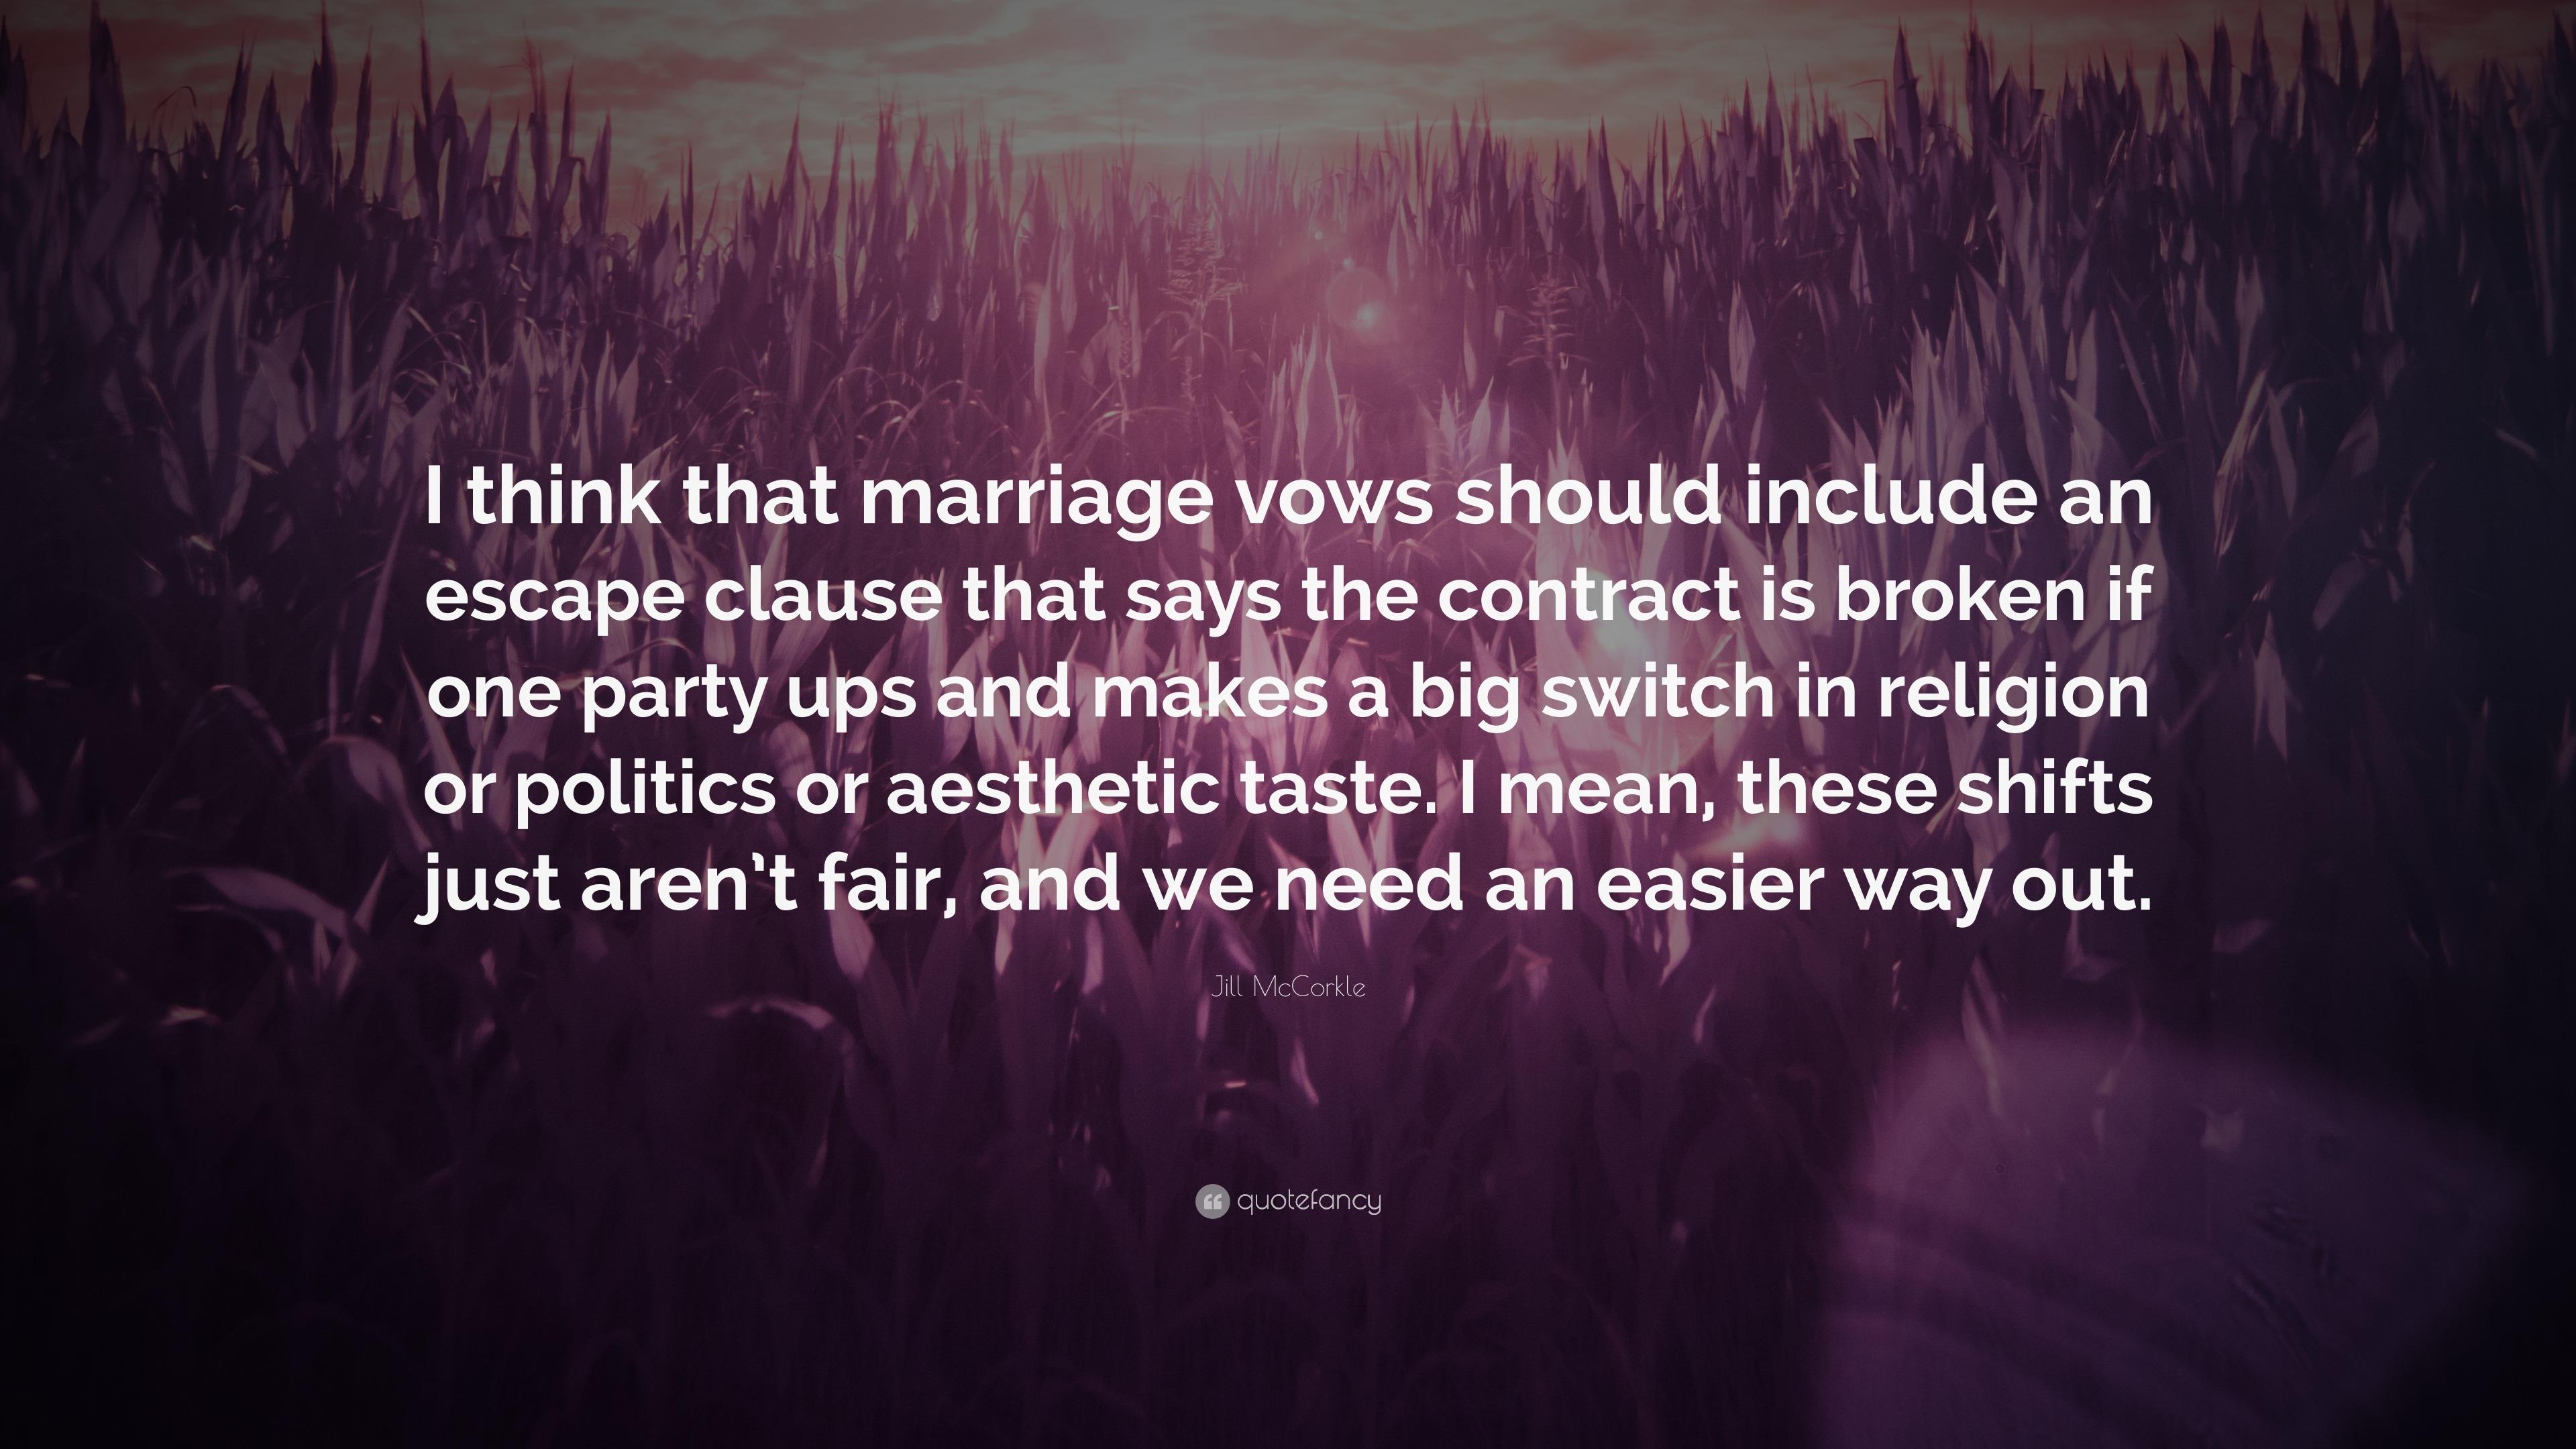 when marriage vows are broken